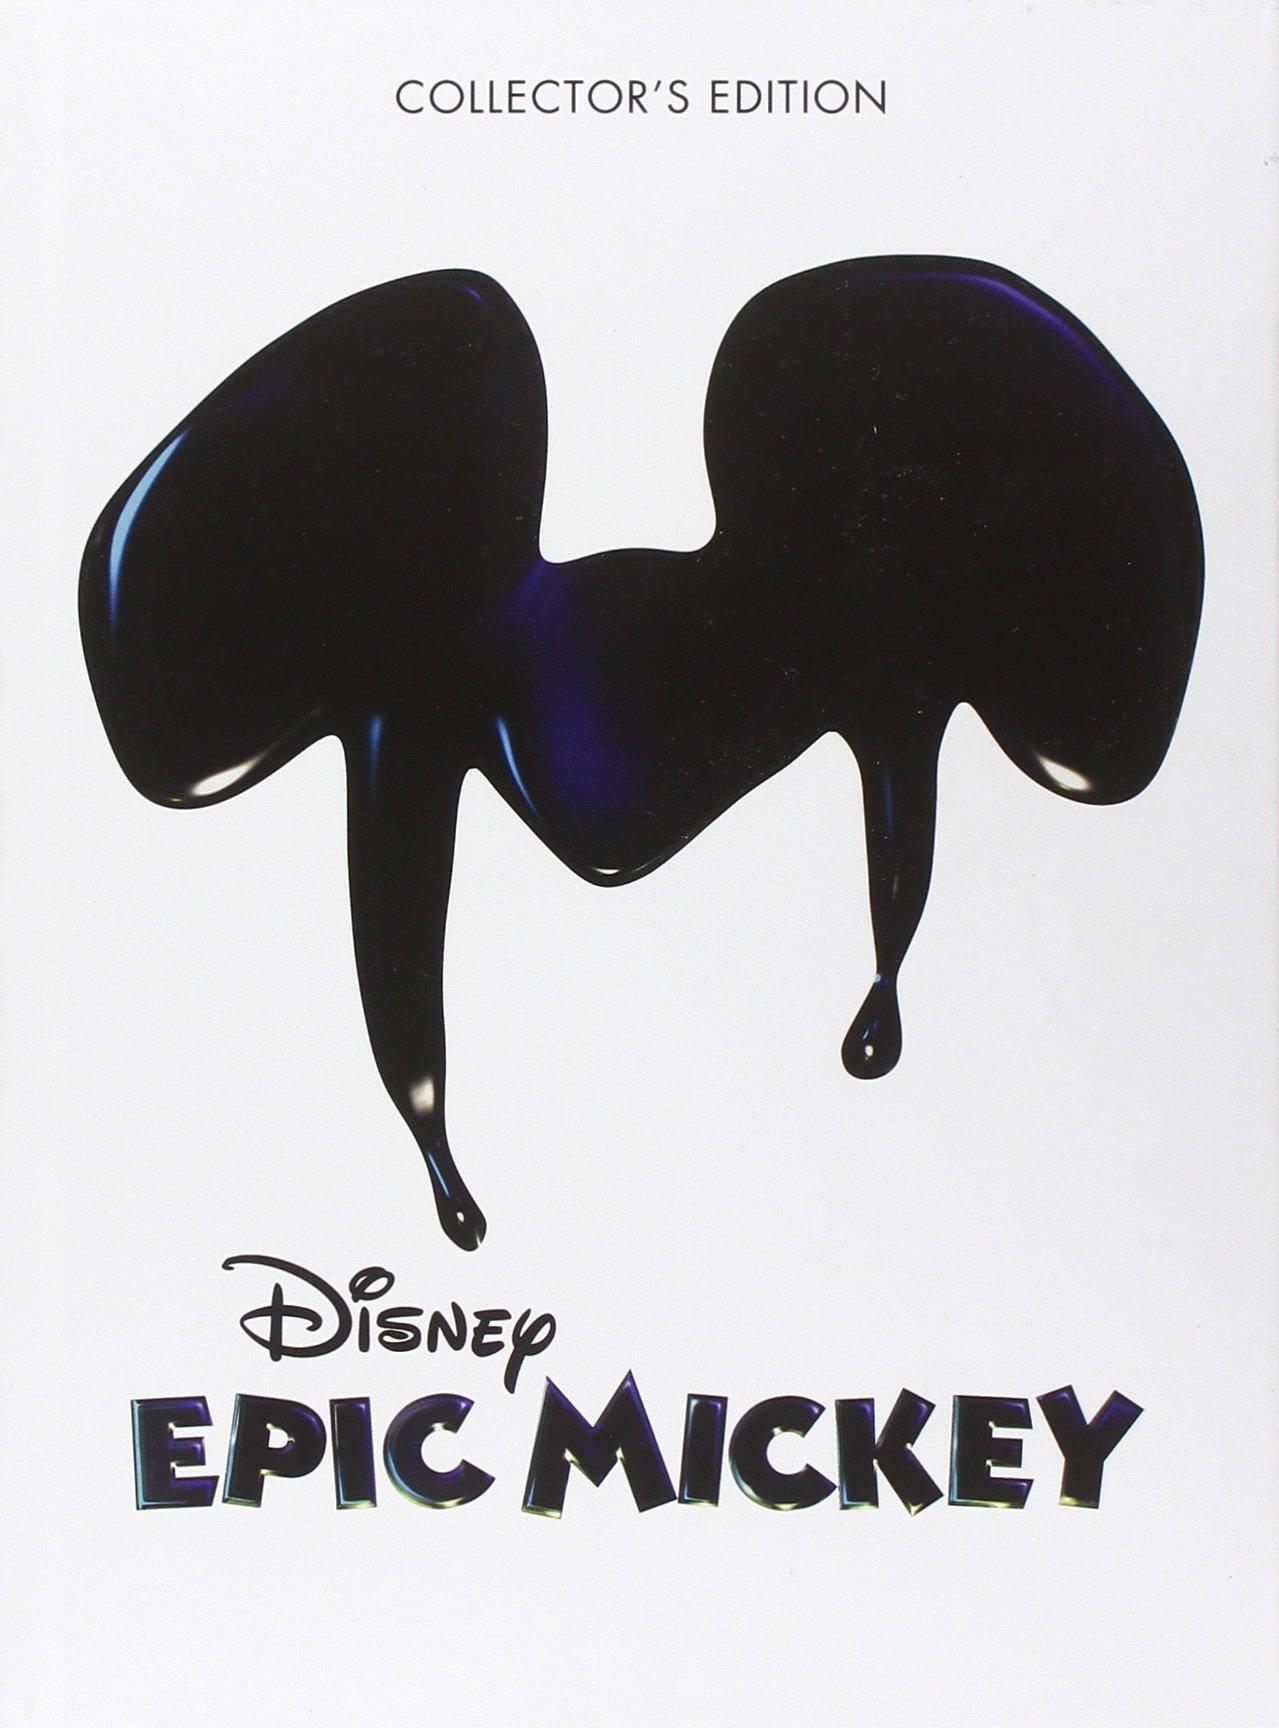 Disney Epic Mickey Collector´s Edition: Prima Official Game Guide Gebundene Ausgabe - 30. November 2010